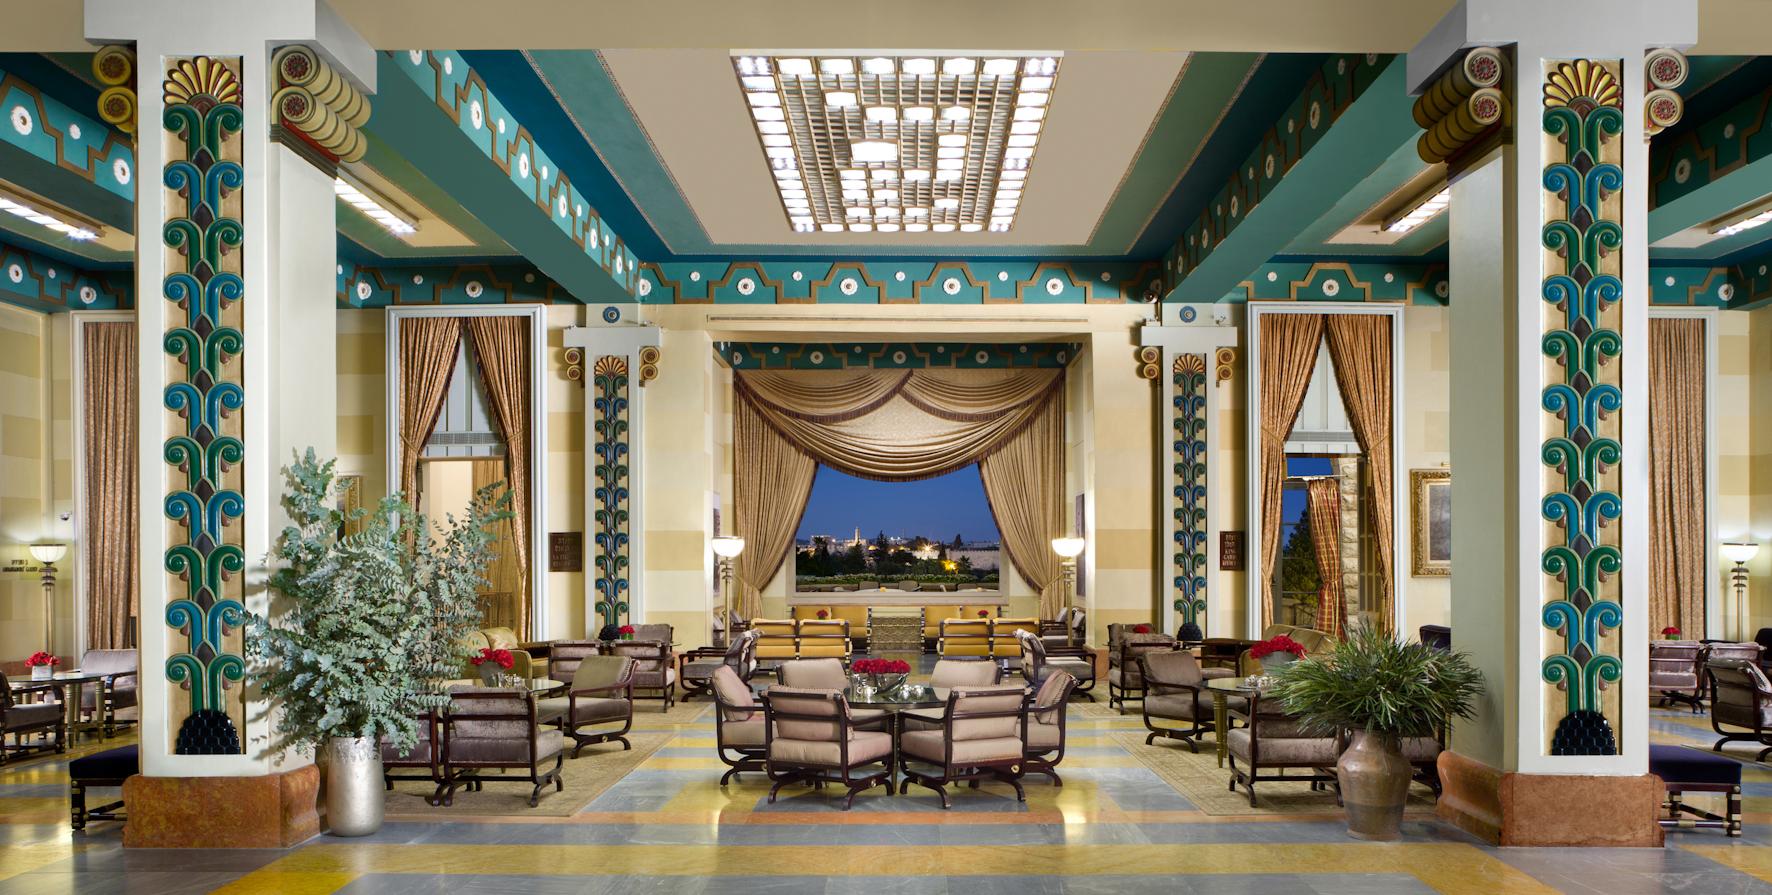 King David Hotel, Jerusalem Israel - Hotel Lobby with view of Old City of Jerusalem